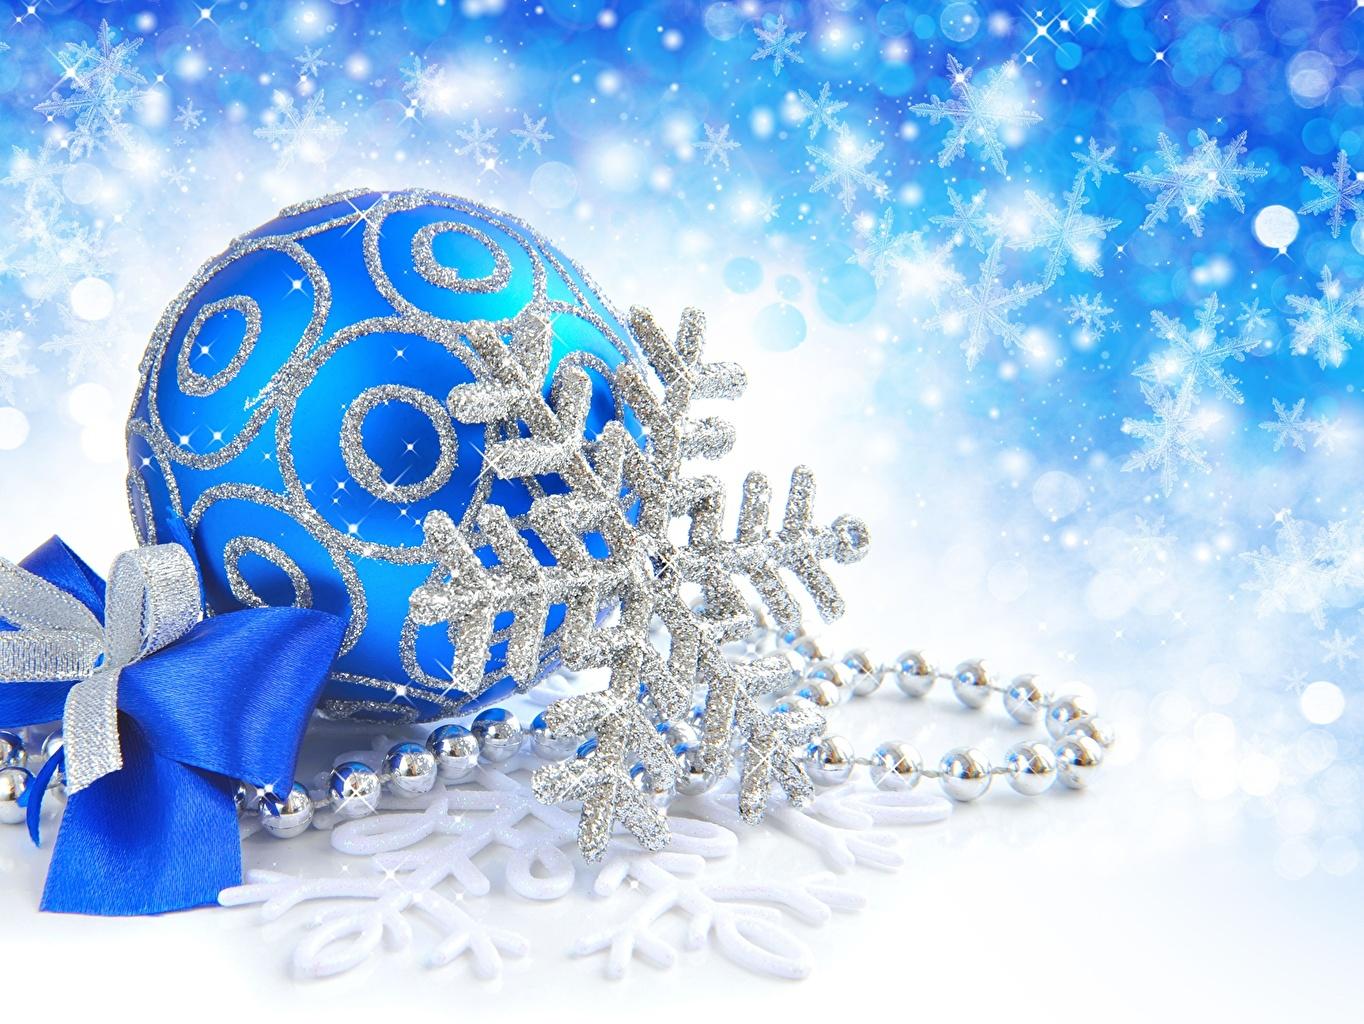 Images Christmas Snowflakes Balls Bowknot Holidays New year bow knot